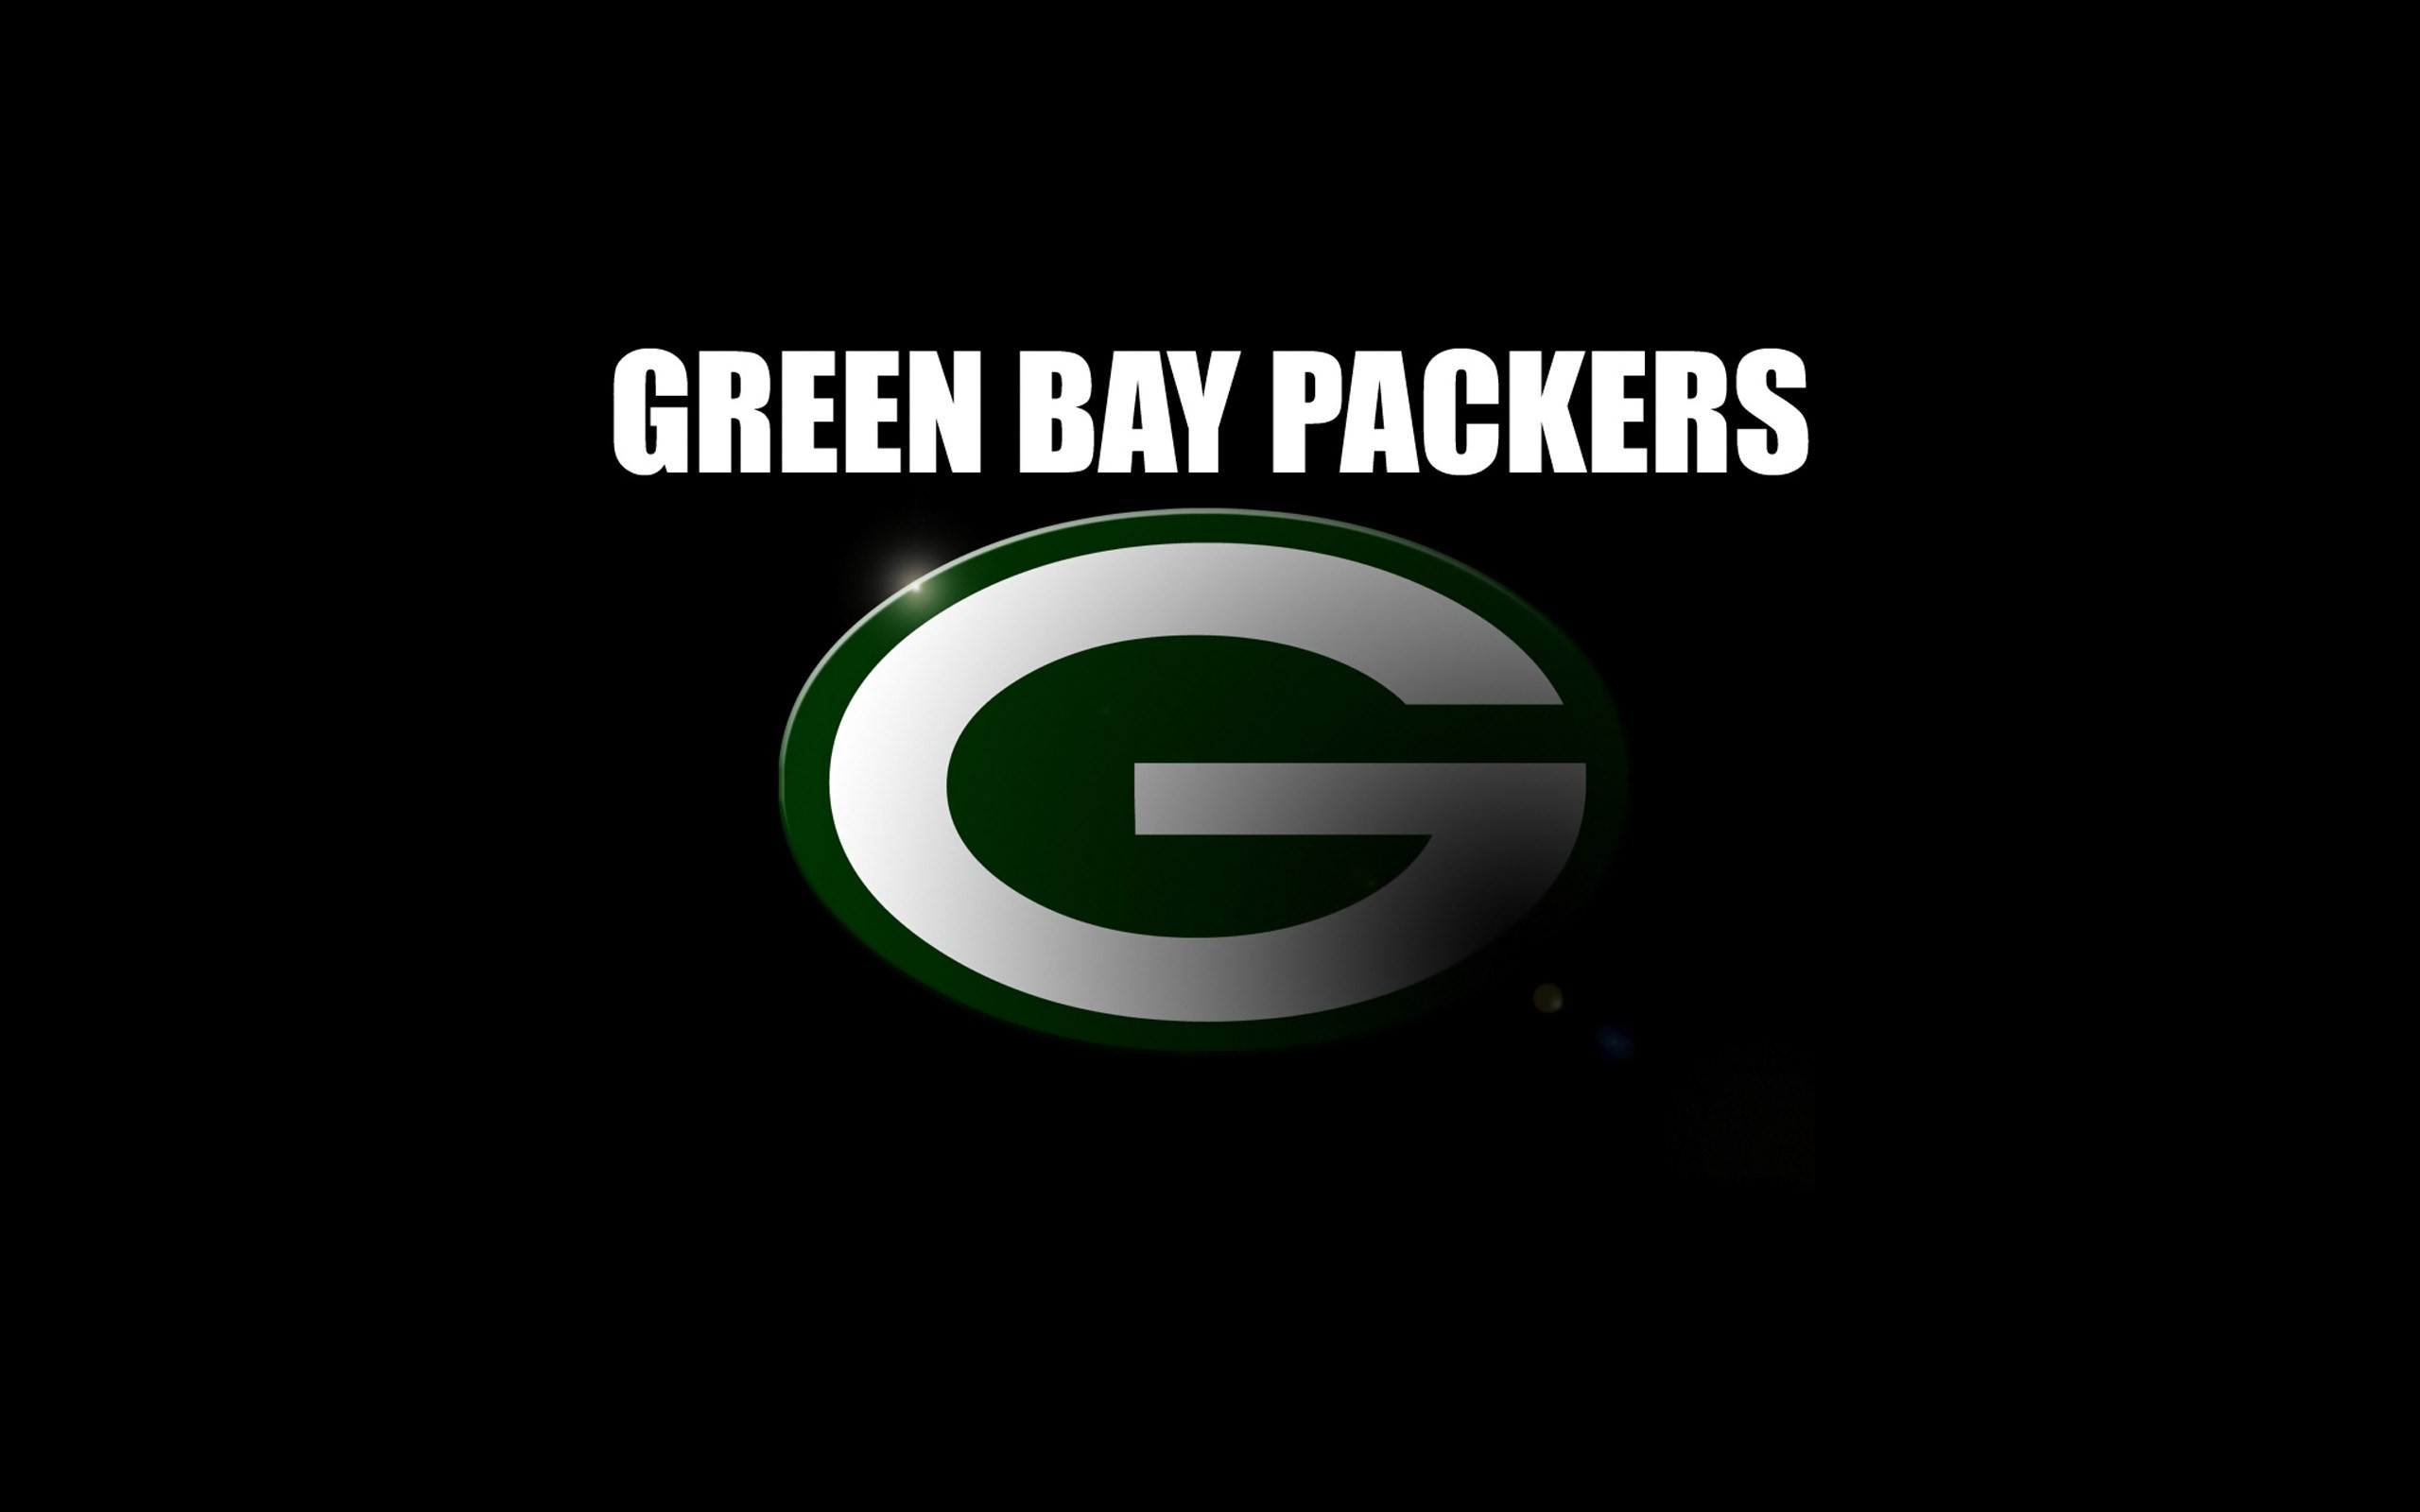 free desktop wallpaper downloads green bay packers